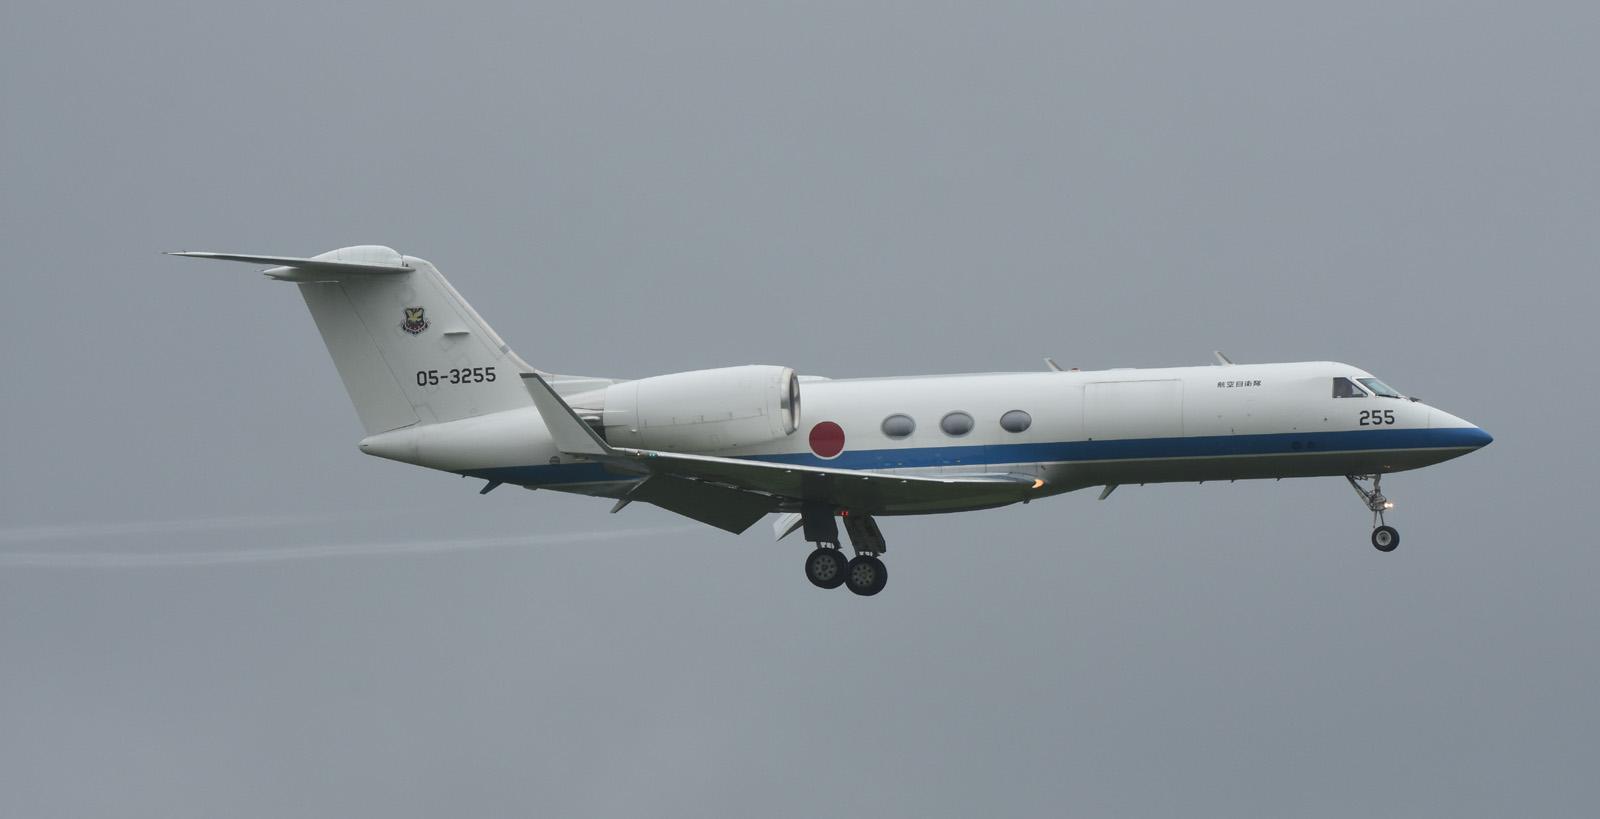 U4160721g125